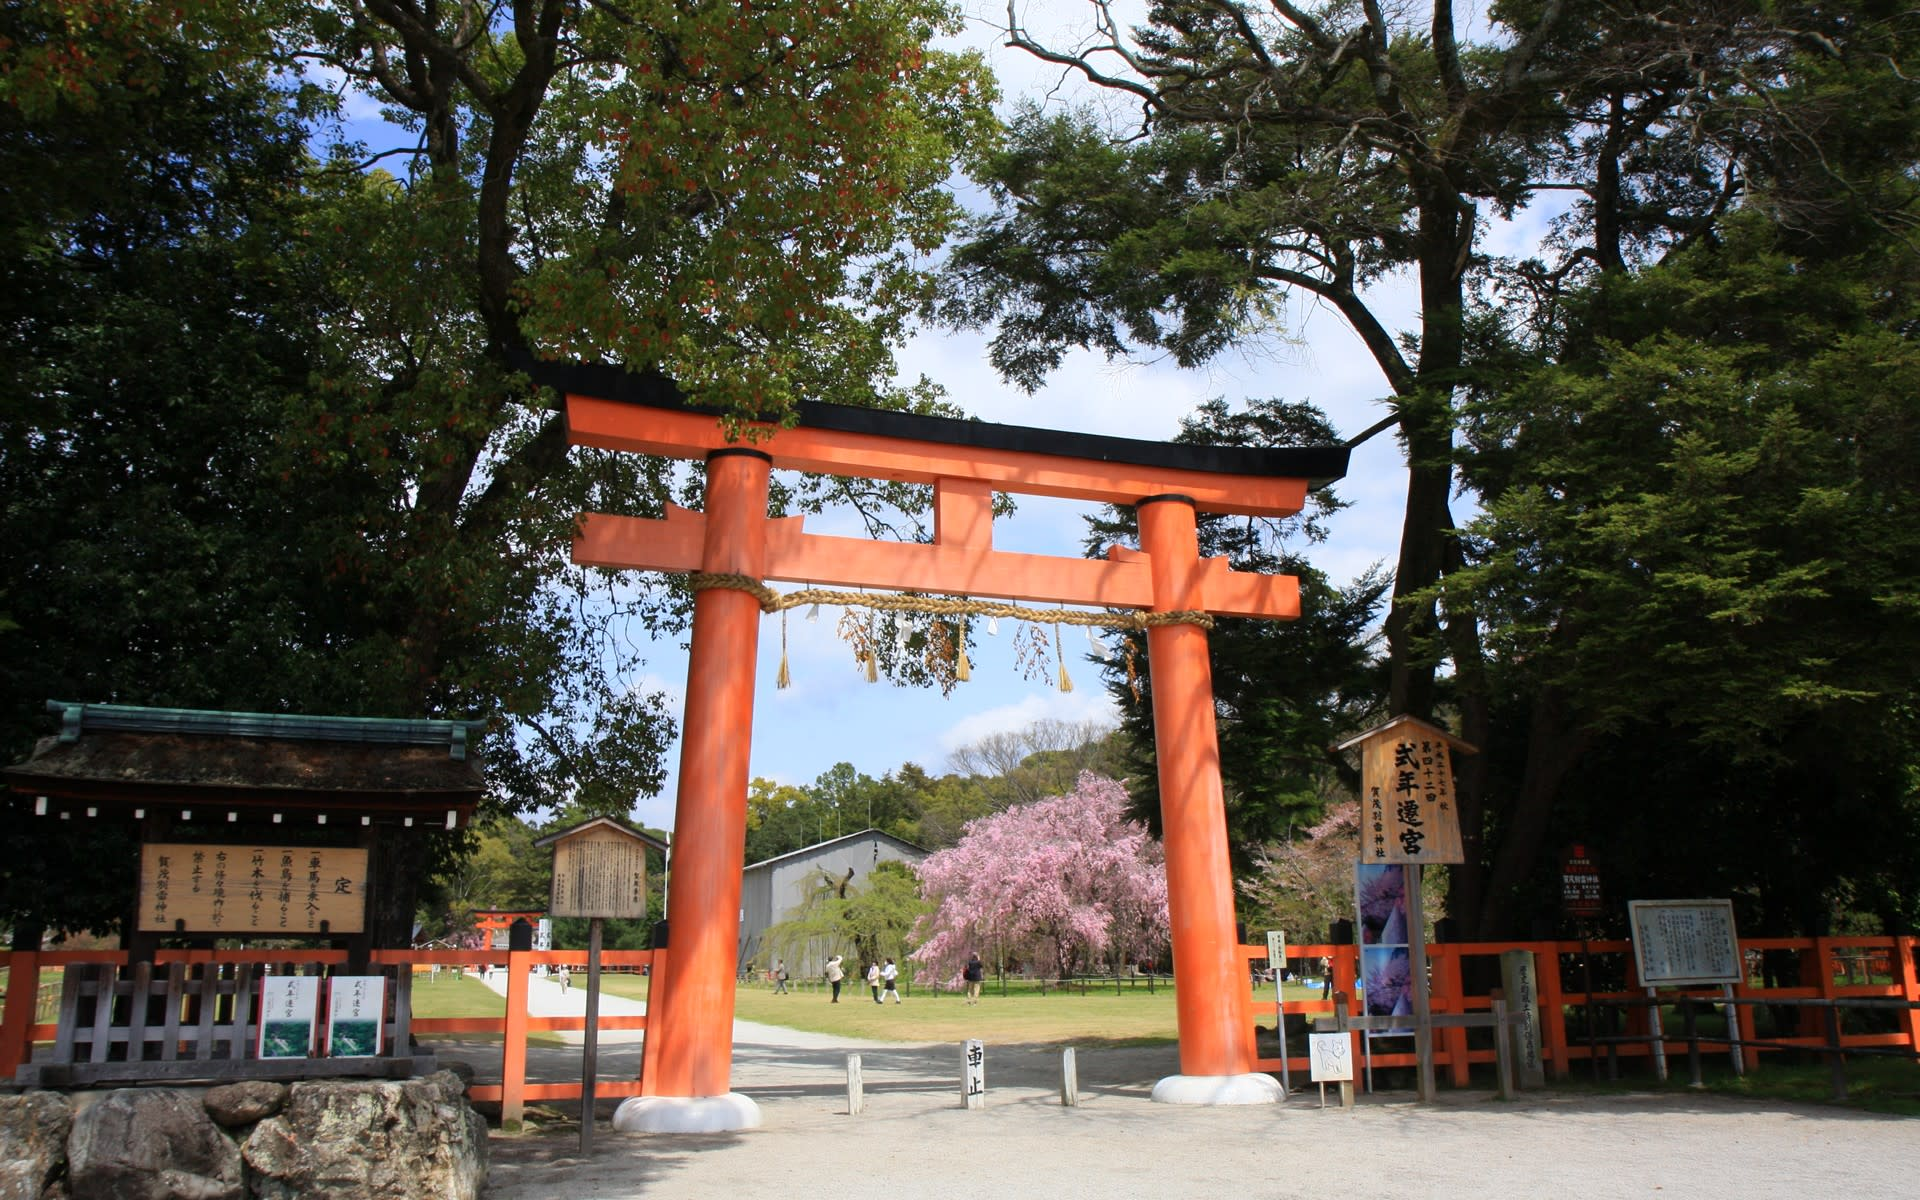 京都 上賀茂神社の桜の壁紙 計29枚 壁紙 日々駄文